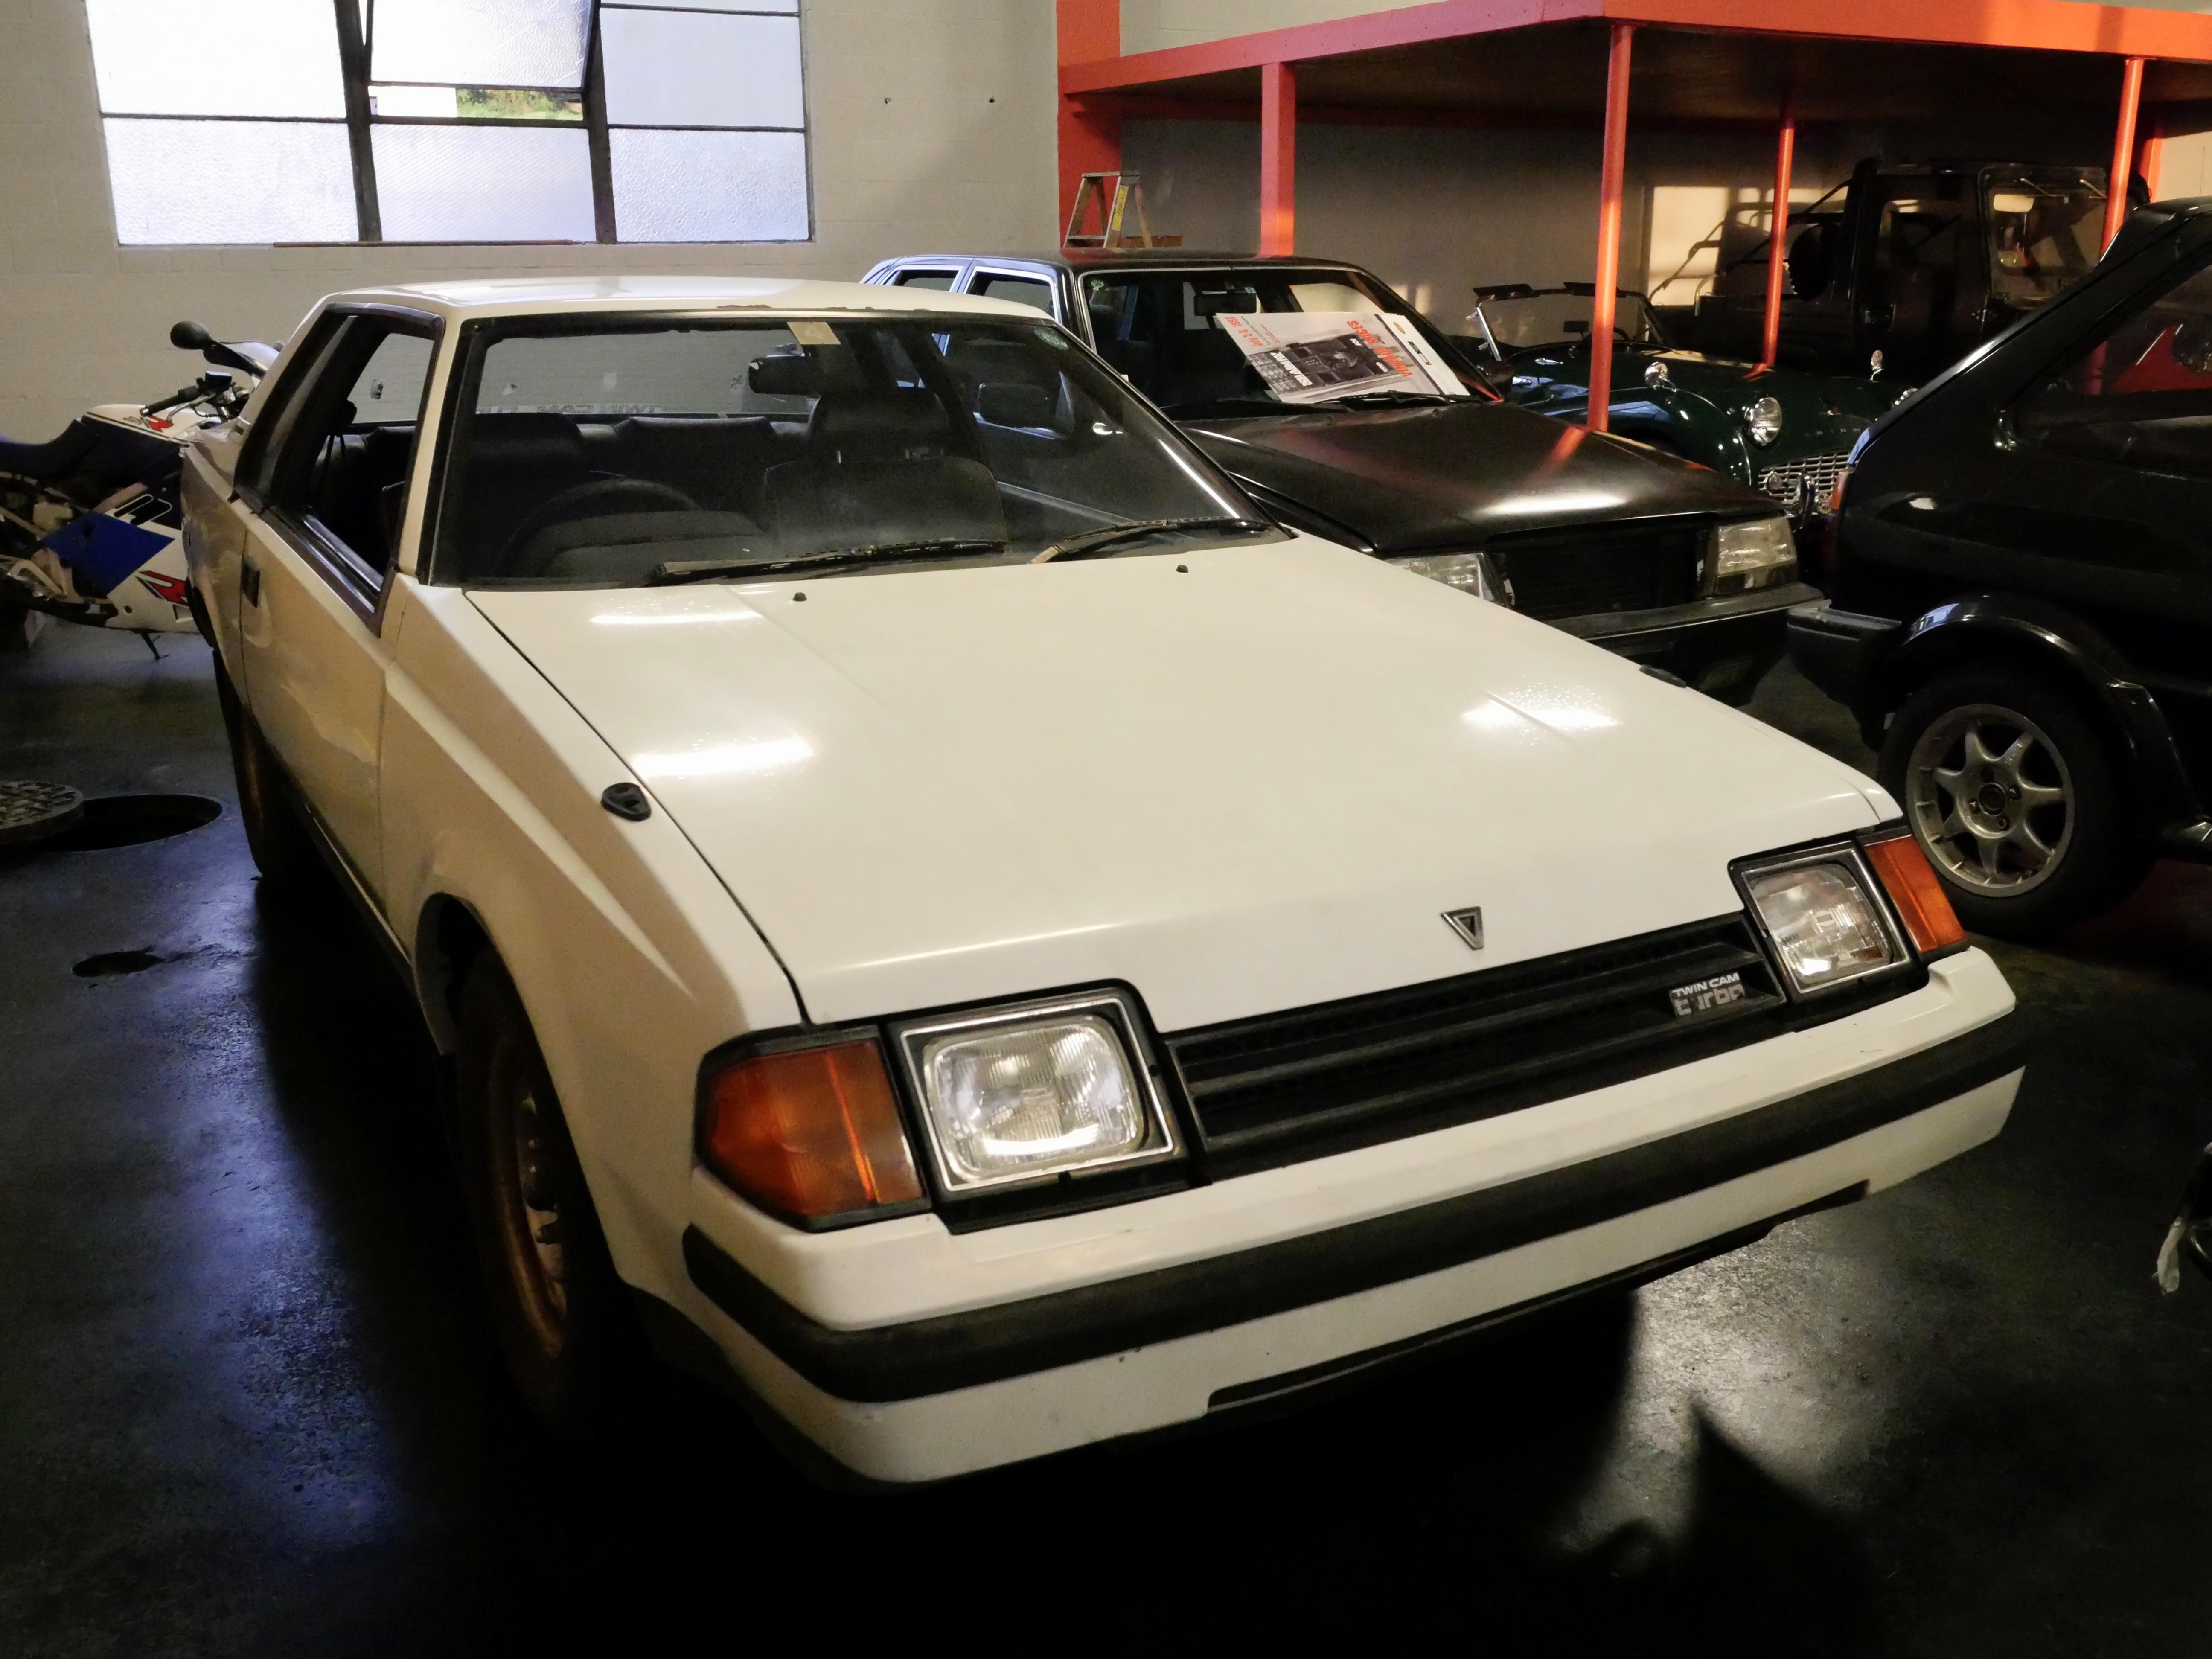 1982 Toyota Celica Twincam Turbo Ta64 Group B Rally Adamsgarage 1983 Gts